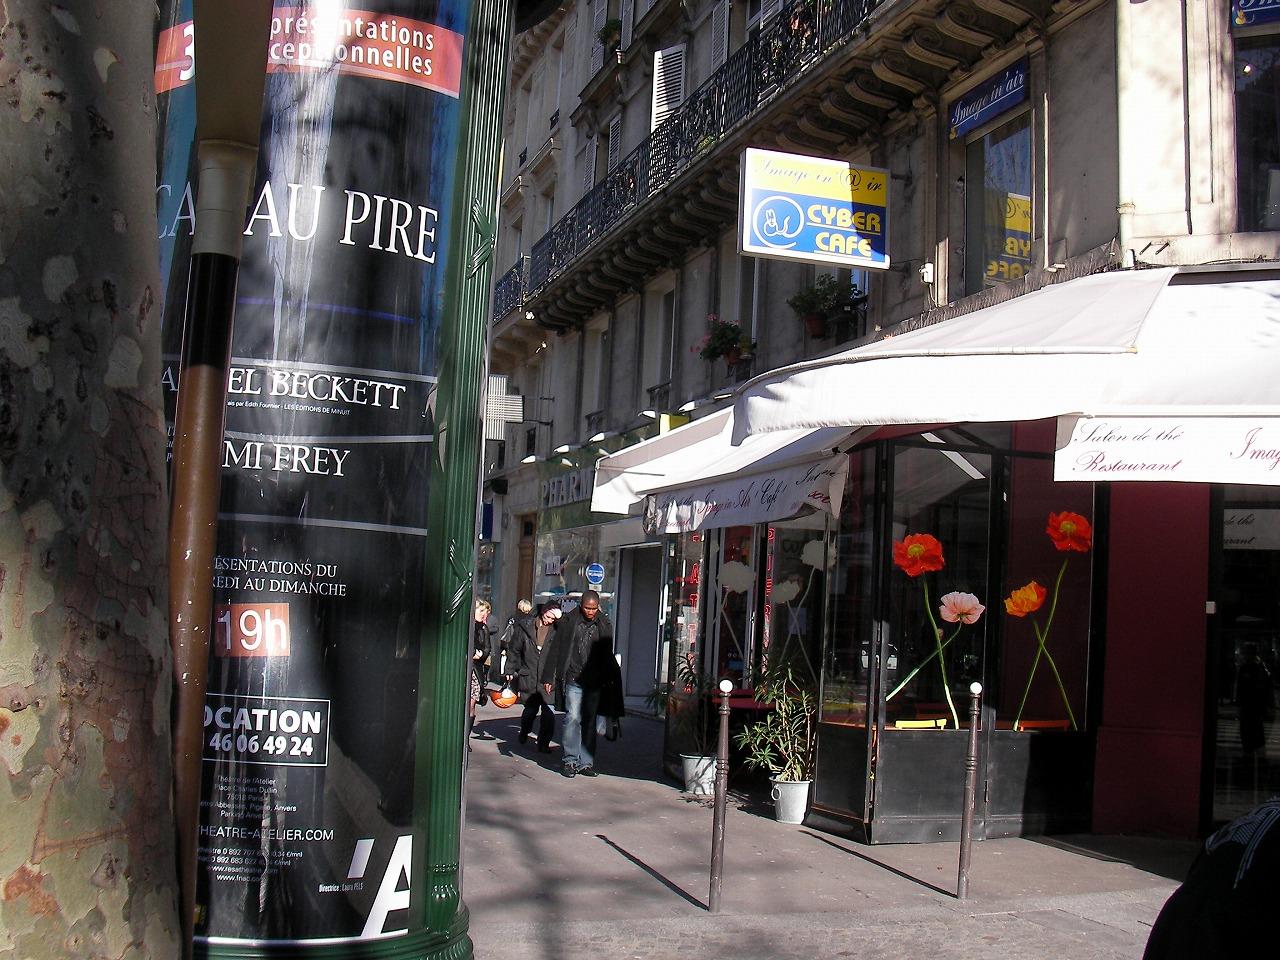 SANY0154 1 - パリの飲み物自動販売機